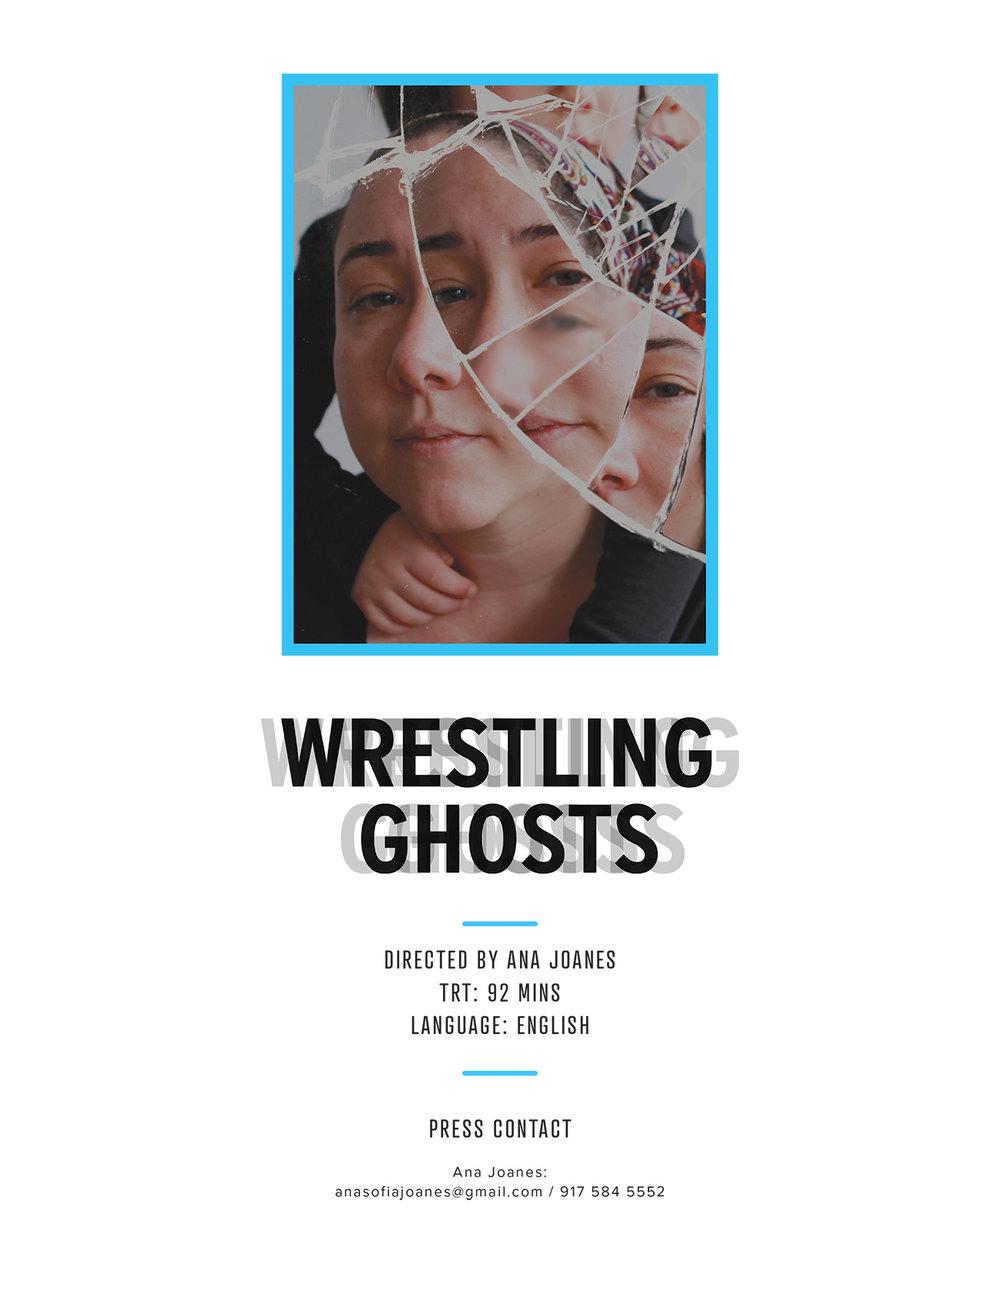 Wrestling Ghosts  Media Kit (1.5 MB PDF)